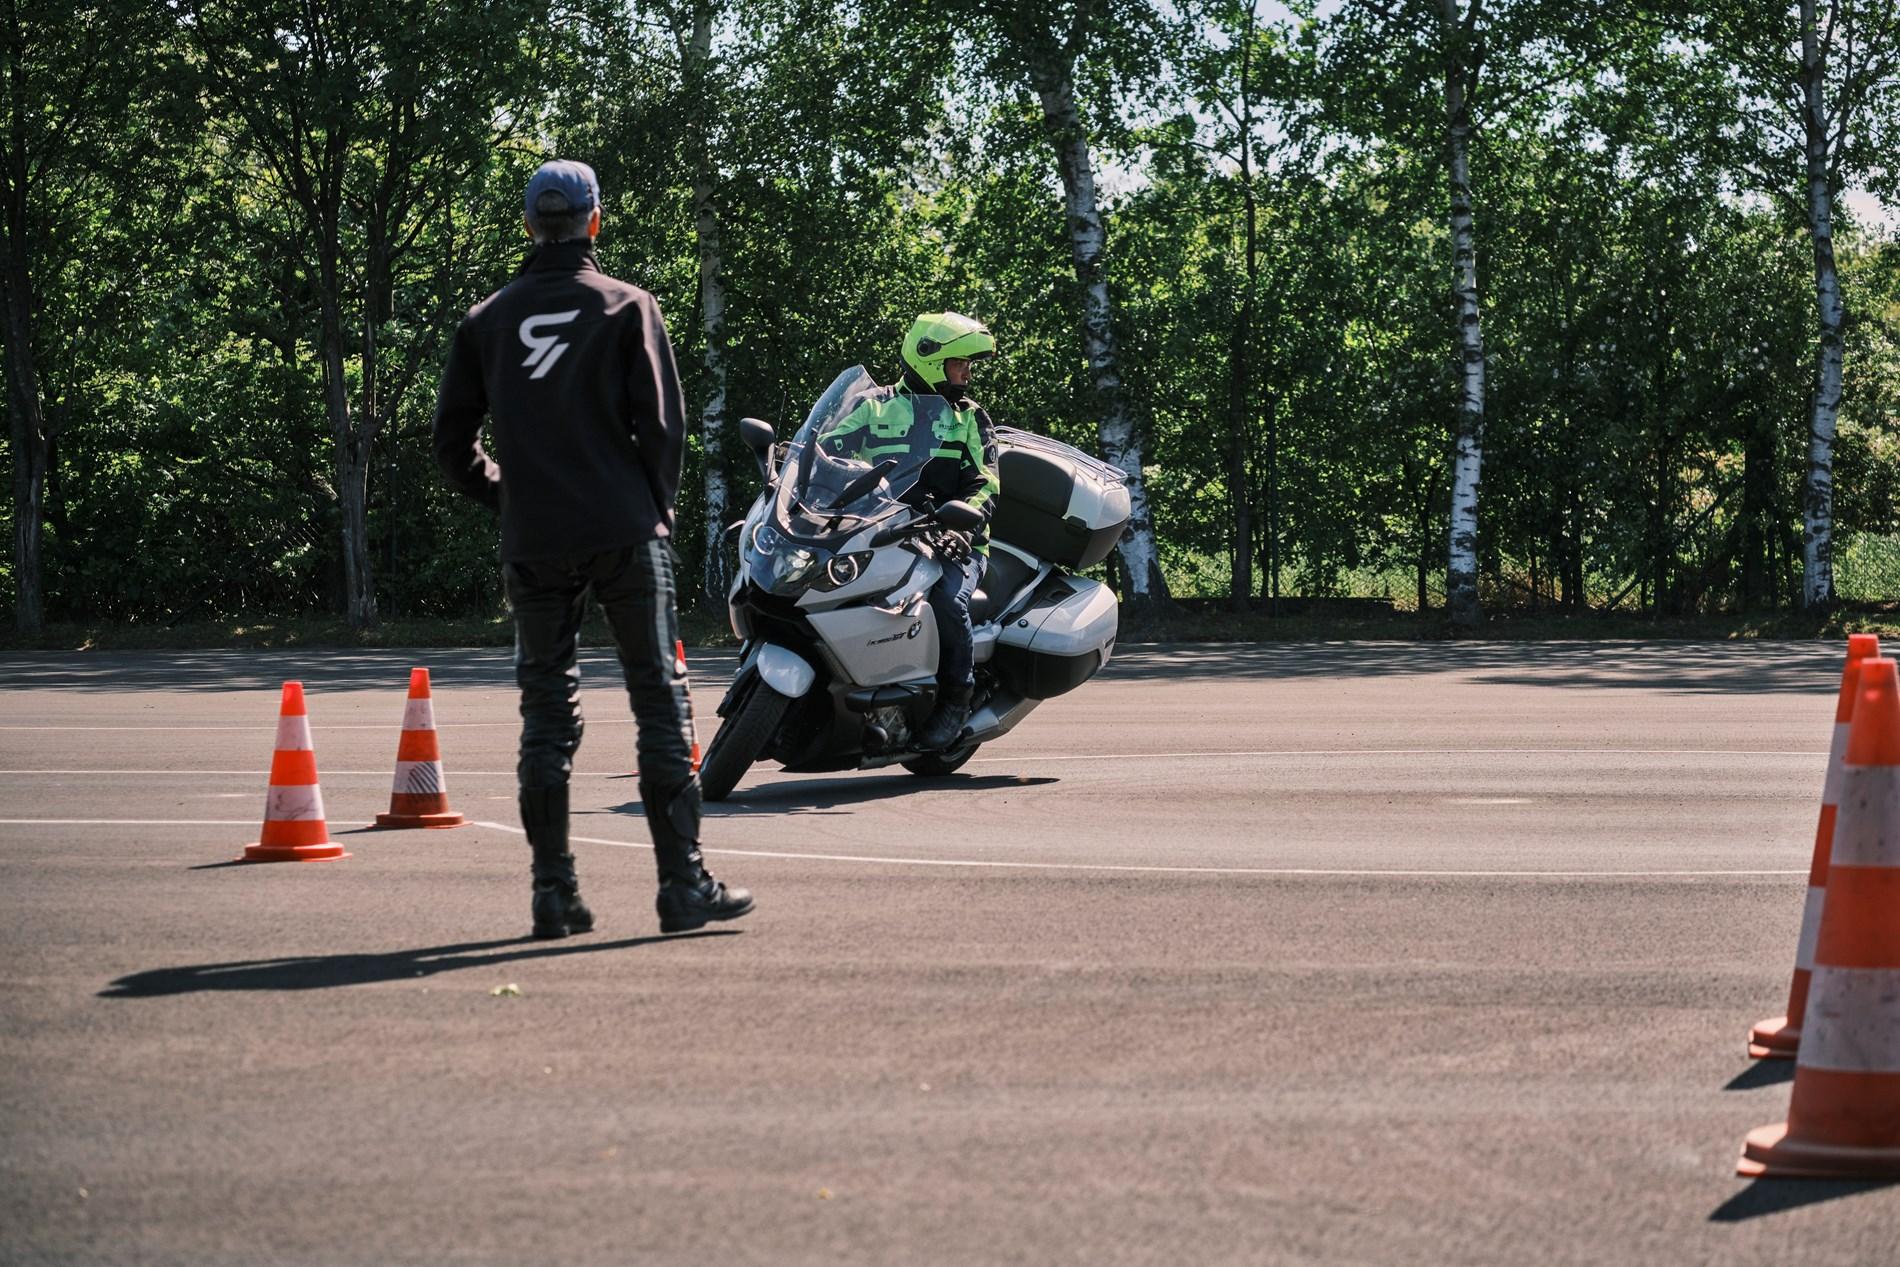 Ultieme motorbeheersing - TraXperience Control - NOG 4 PLAATSEN